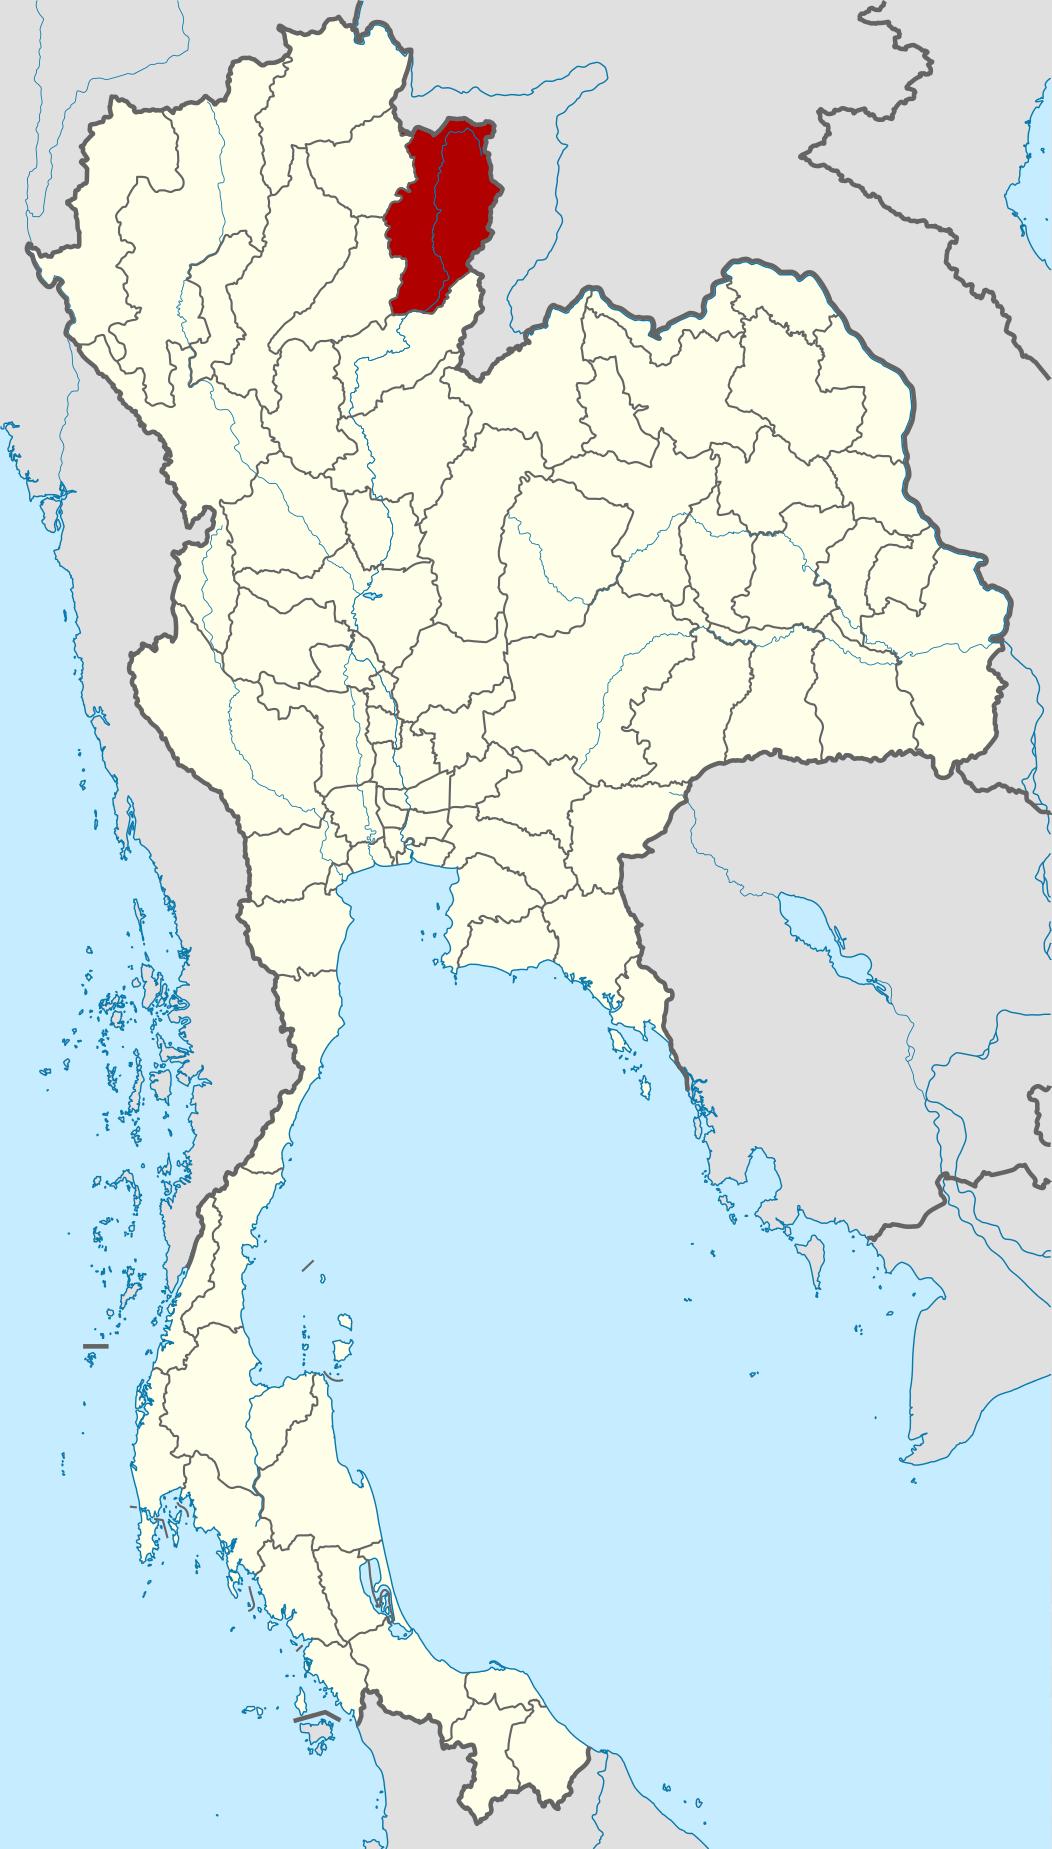 thailand_nan_locator_map-svg